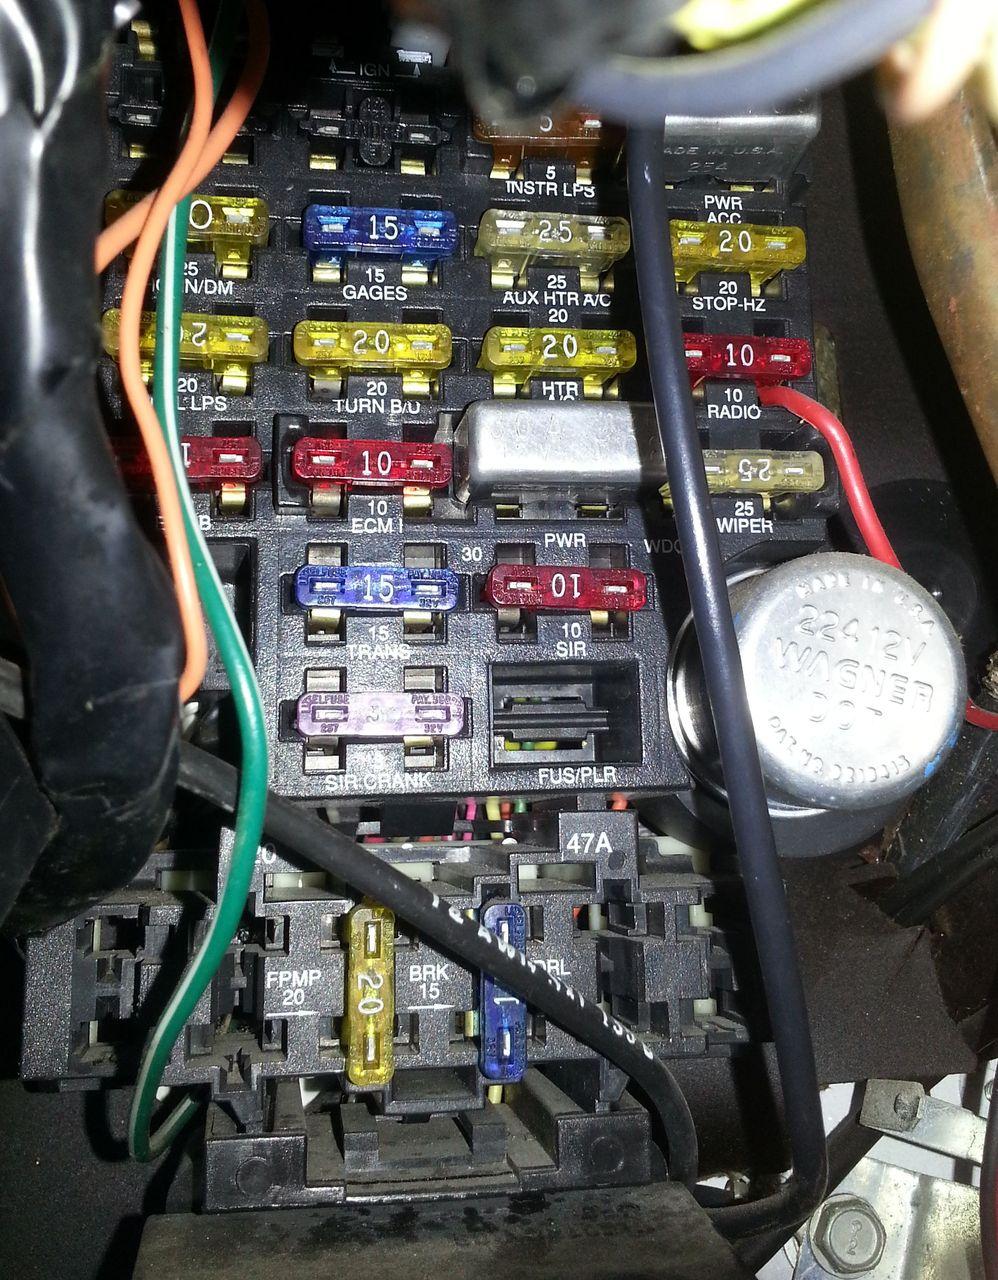 89 chevy g20 wiring diagram wiring diagrams chevy 3 wire alternator wiring diagram 1989 chevy van fuse box schematic diagram 89 chevy g20 wiring